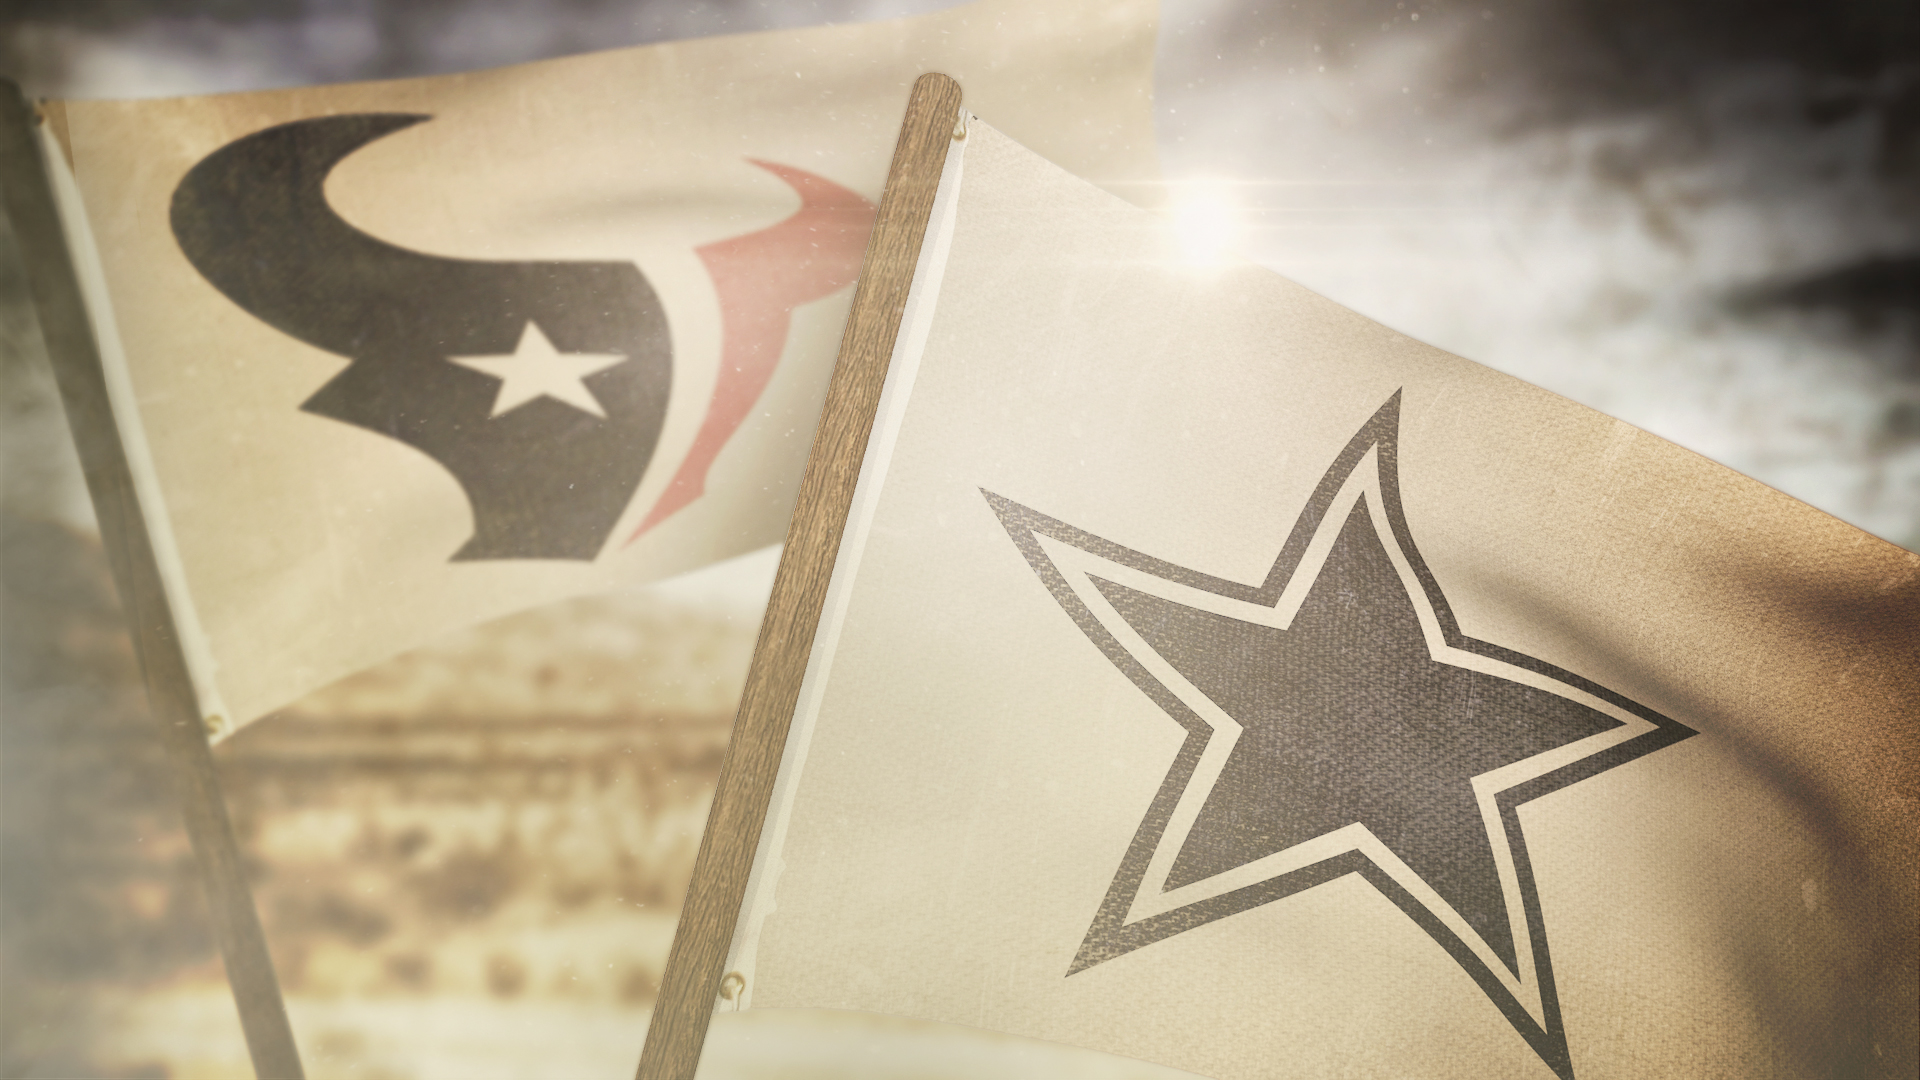 Cowboys2018_MatchUp_Concept_001.jpg